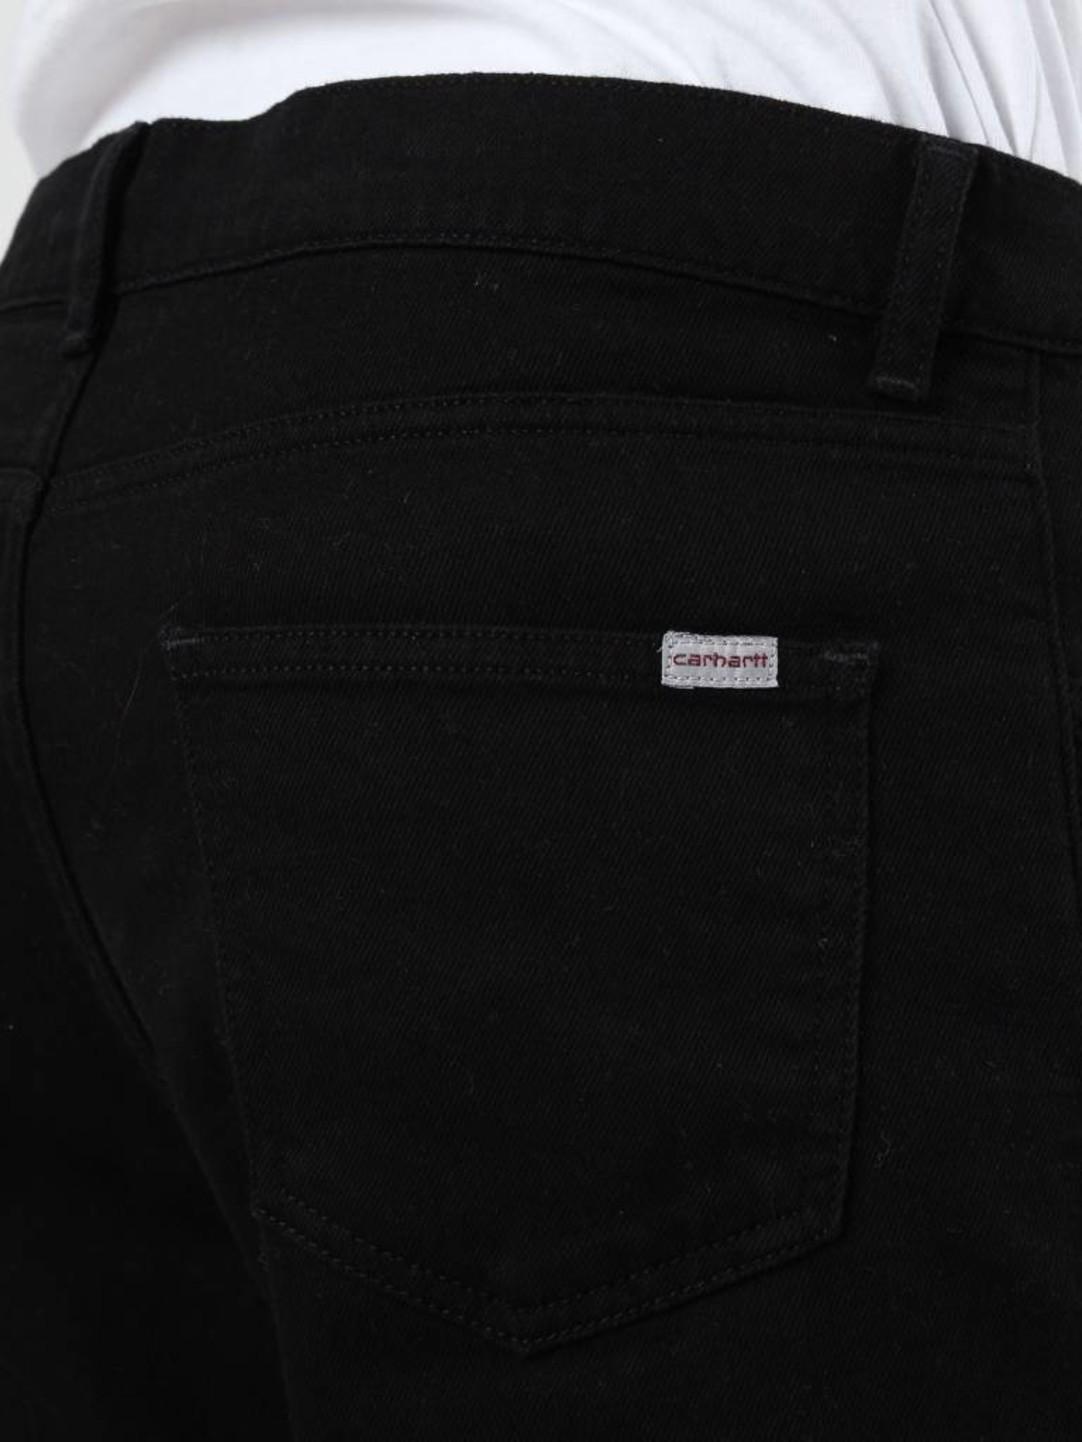 Carhartt WIP Carhartt WIP Coast Pant Rinsed Black I024907-8902